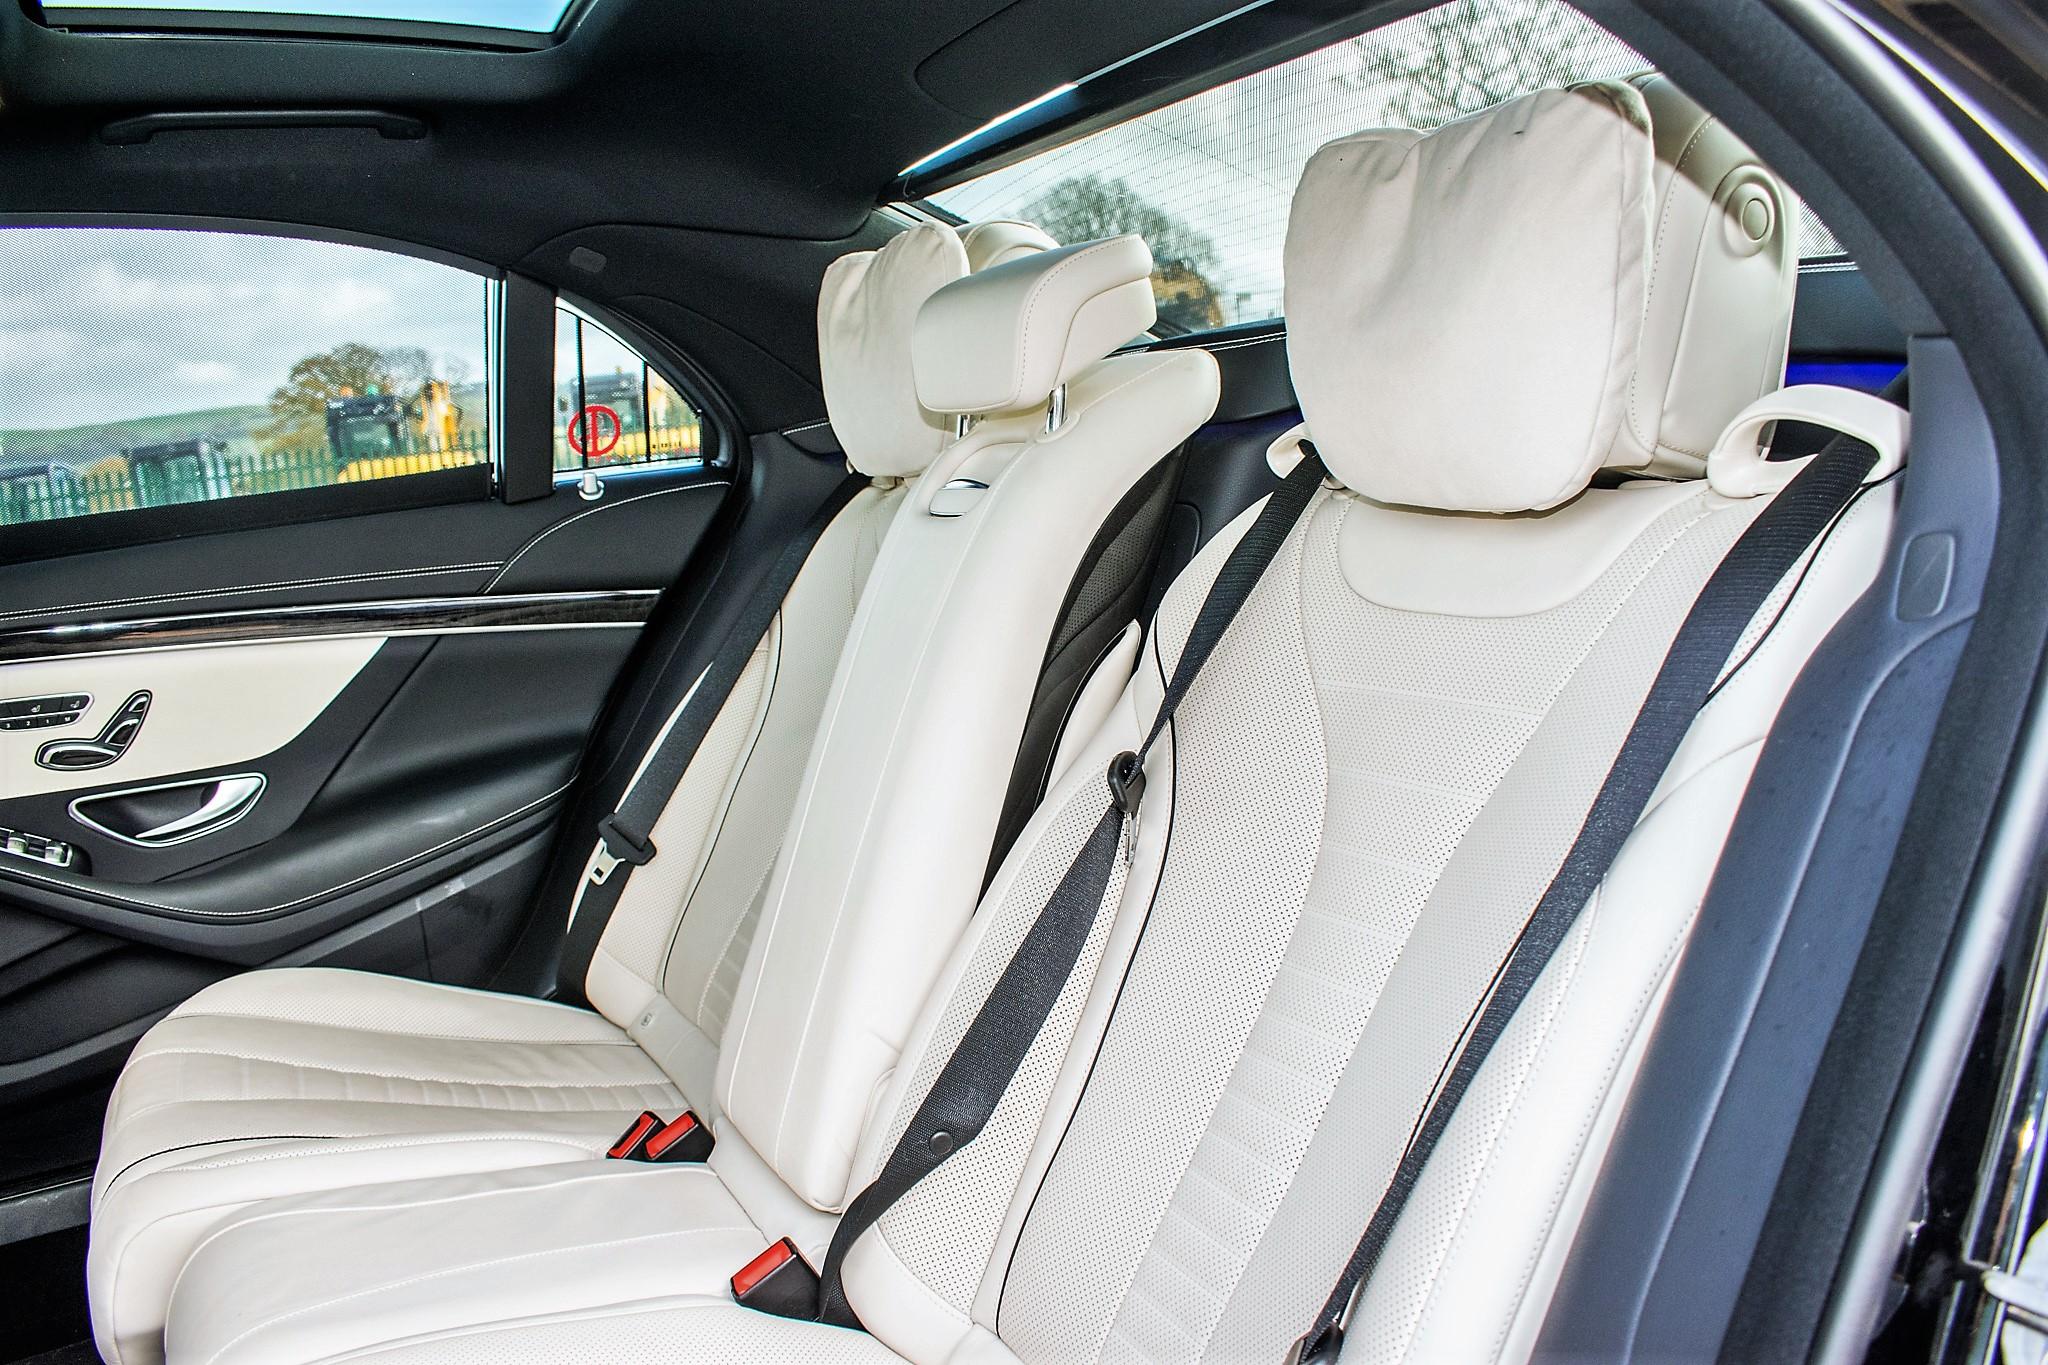 Mercedes Benz S450 L AMG Line Executive auto petrol 4 door saloon car Registration Number: FX68 - Image 23 of 30